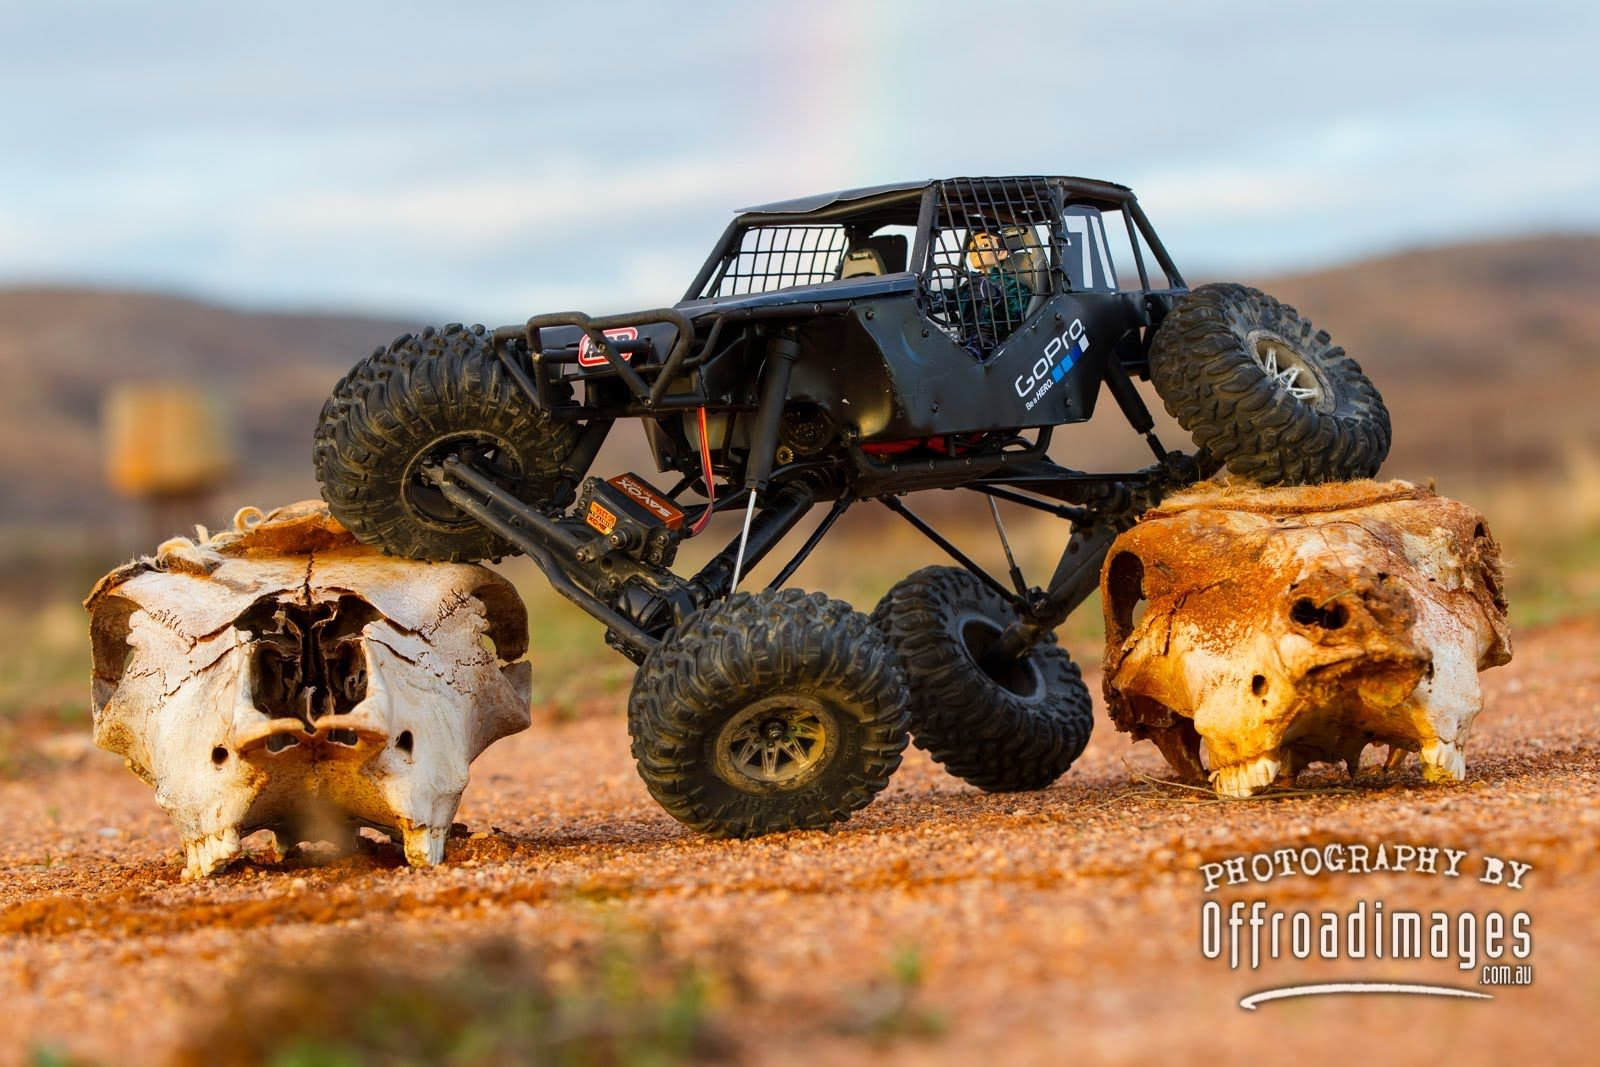 Tim's Custom Axial Wraith crawling in Broken Hill